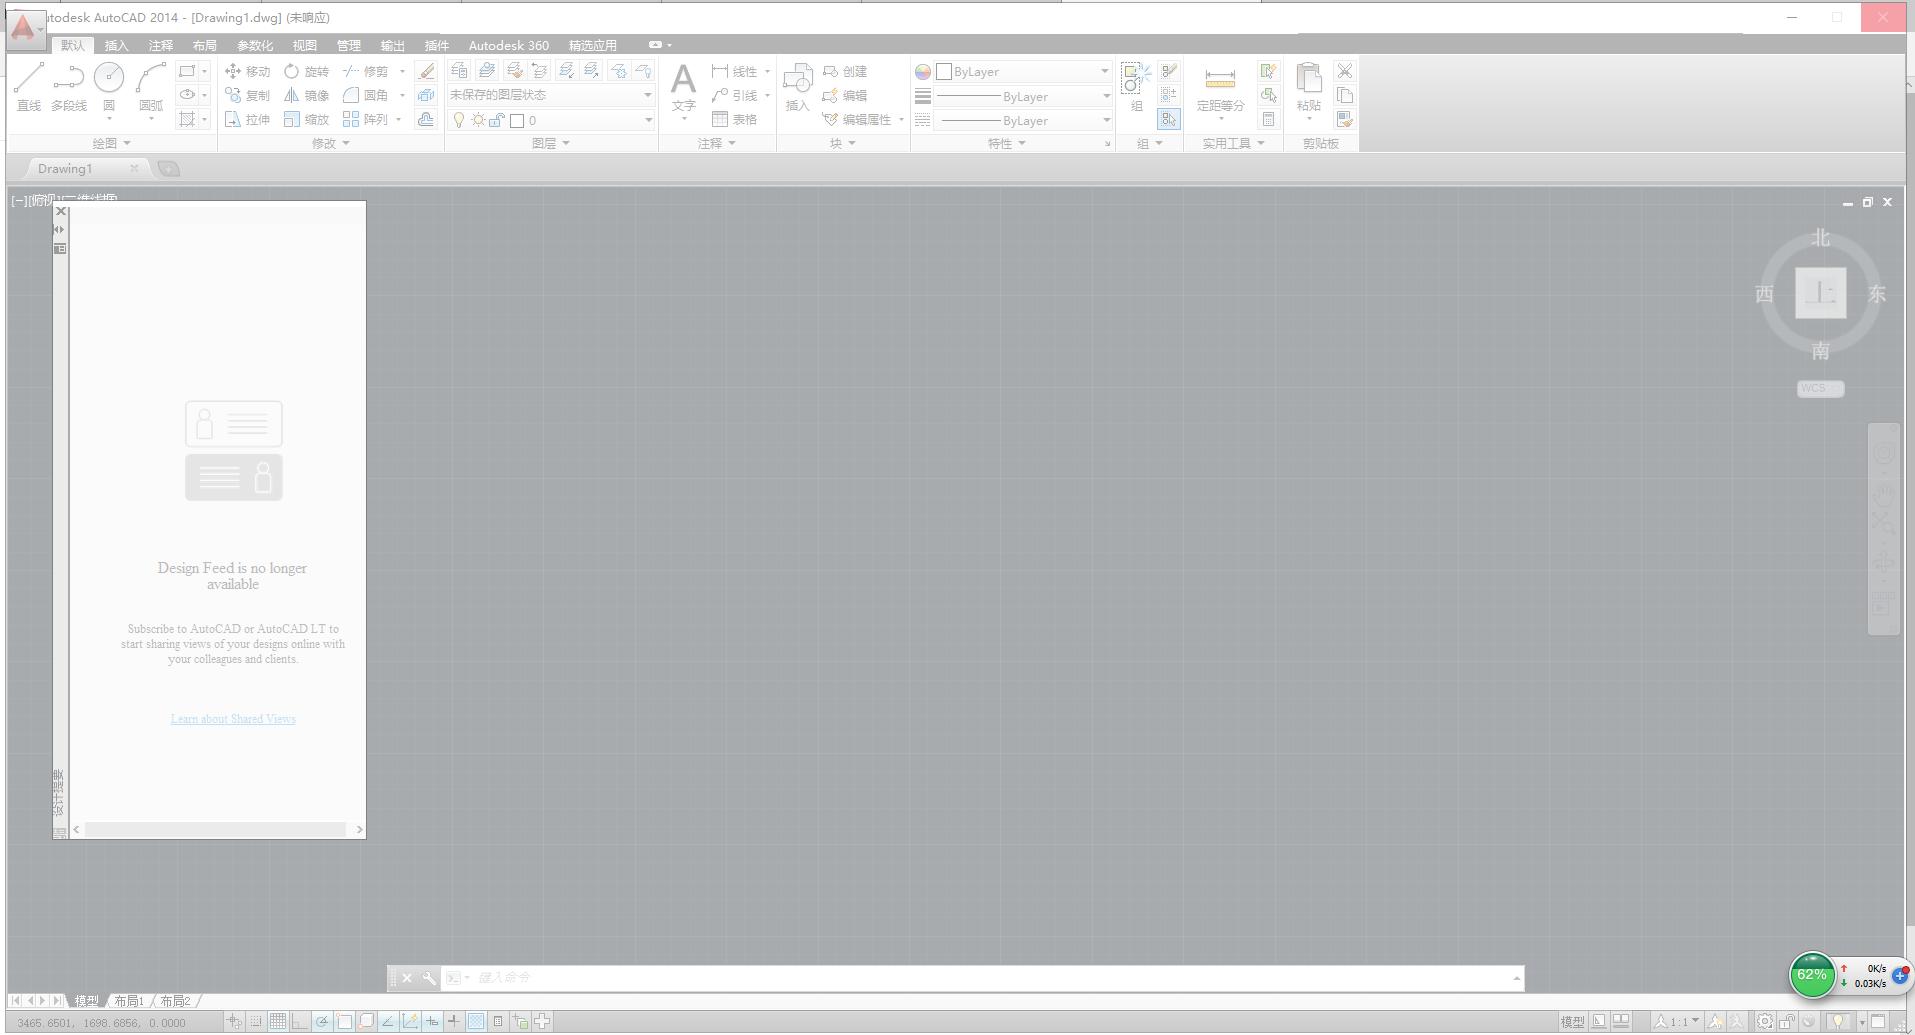 cad2014(64位)弹出文件加载-a文件问题家庭影院cad图立面图片